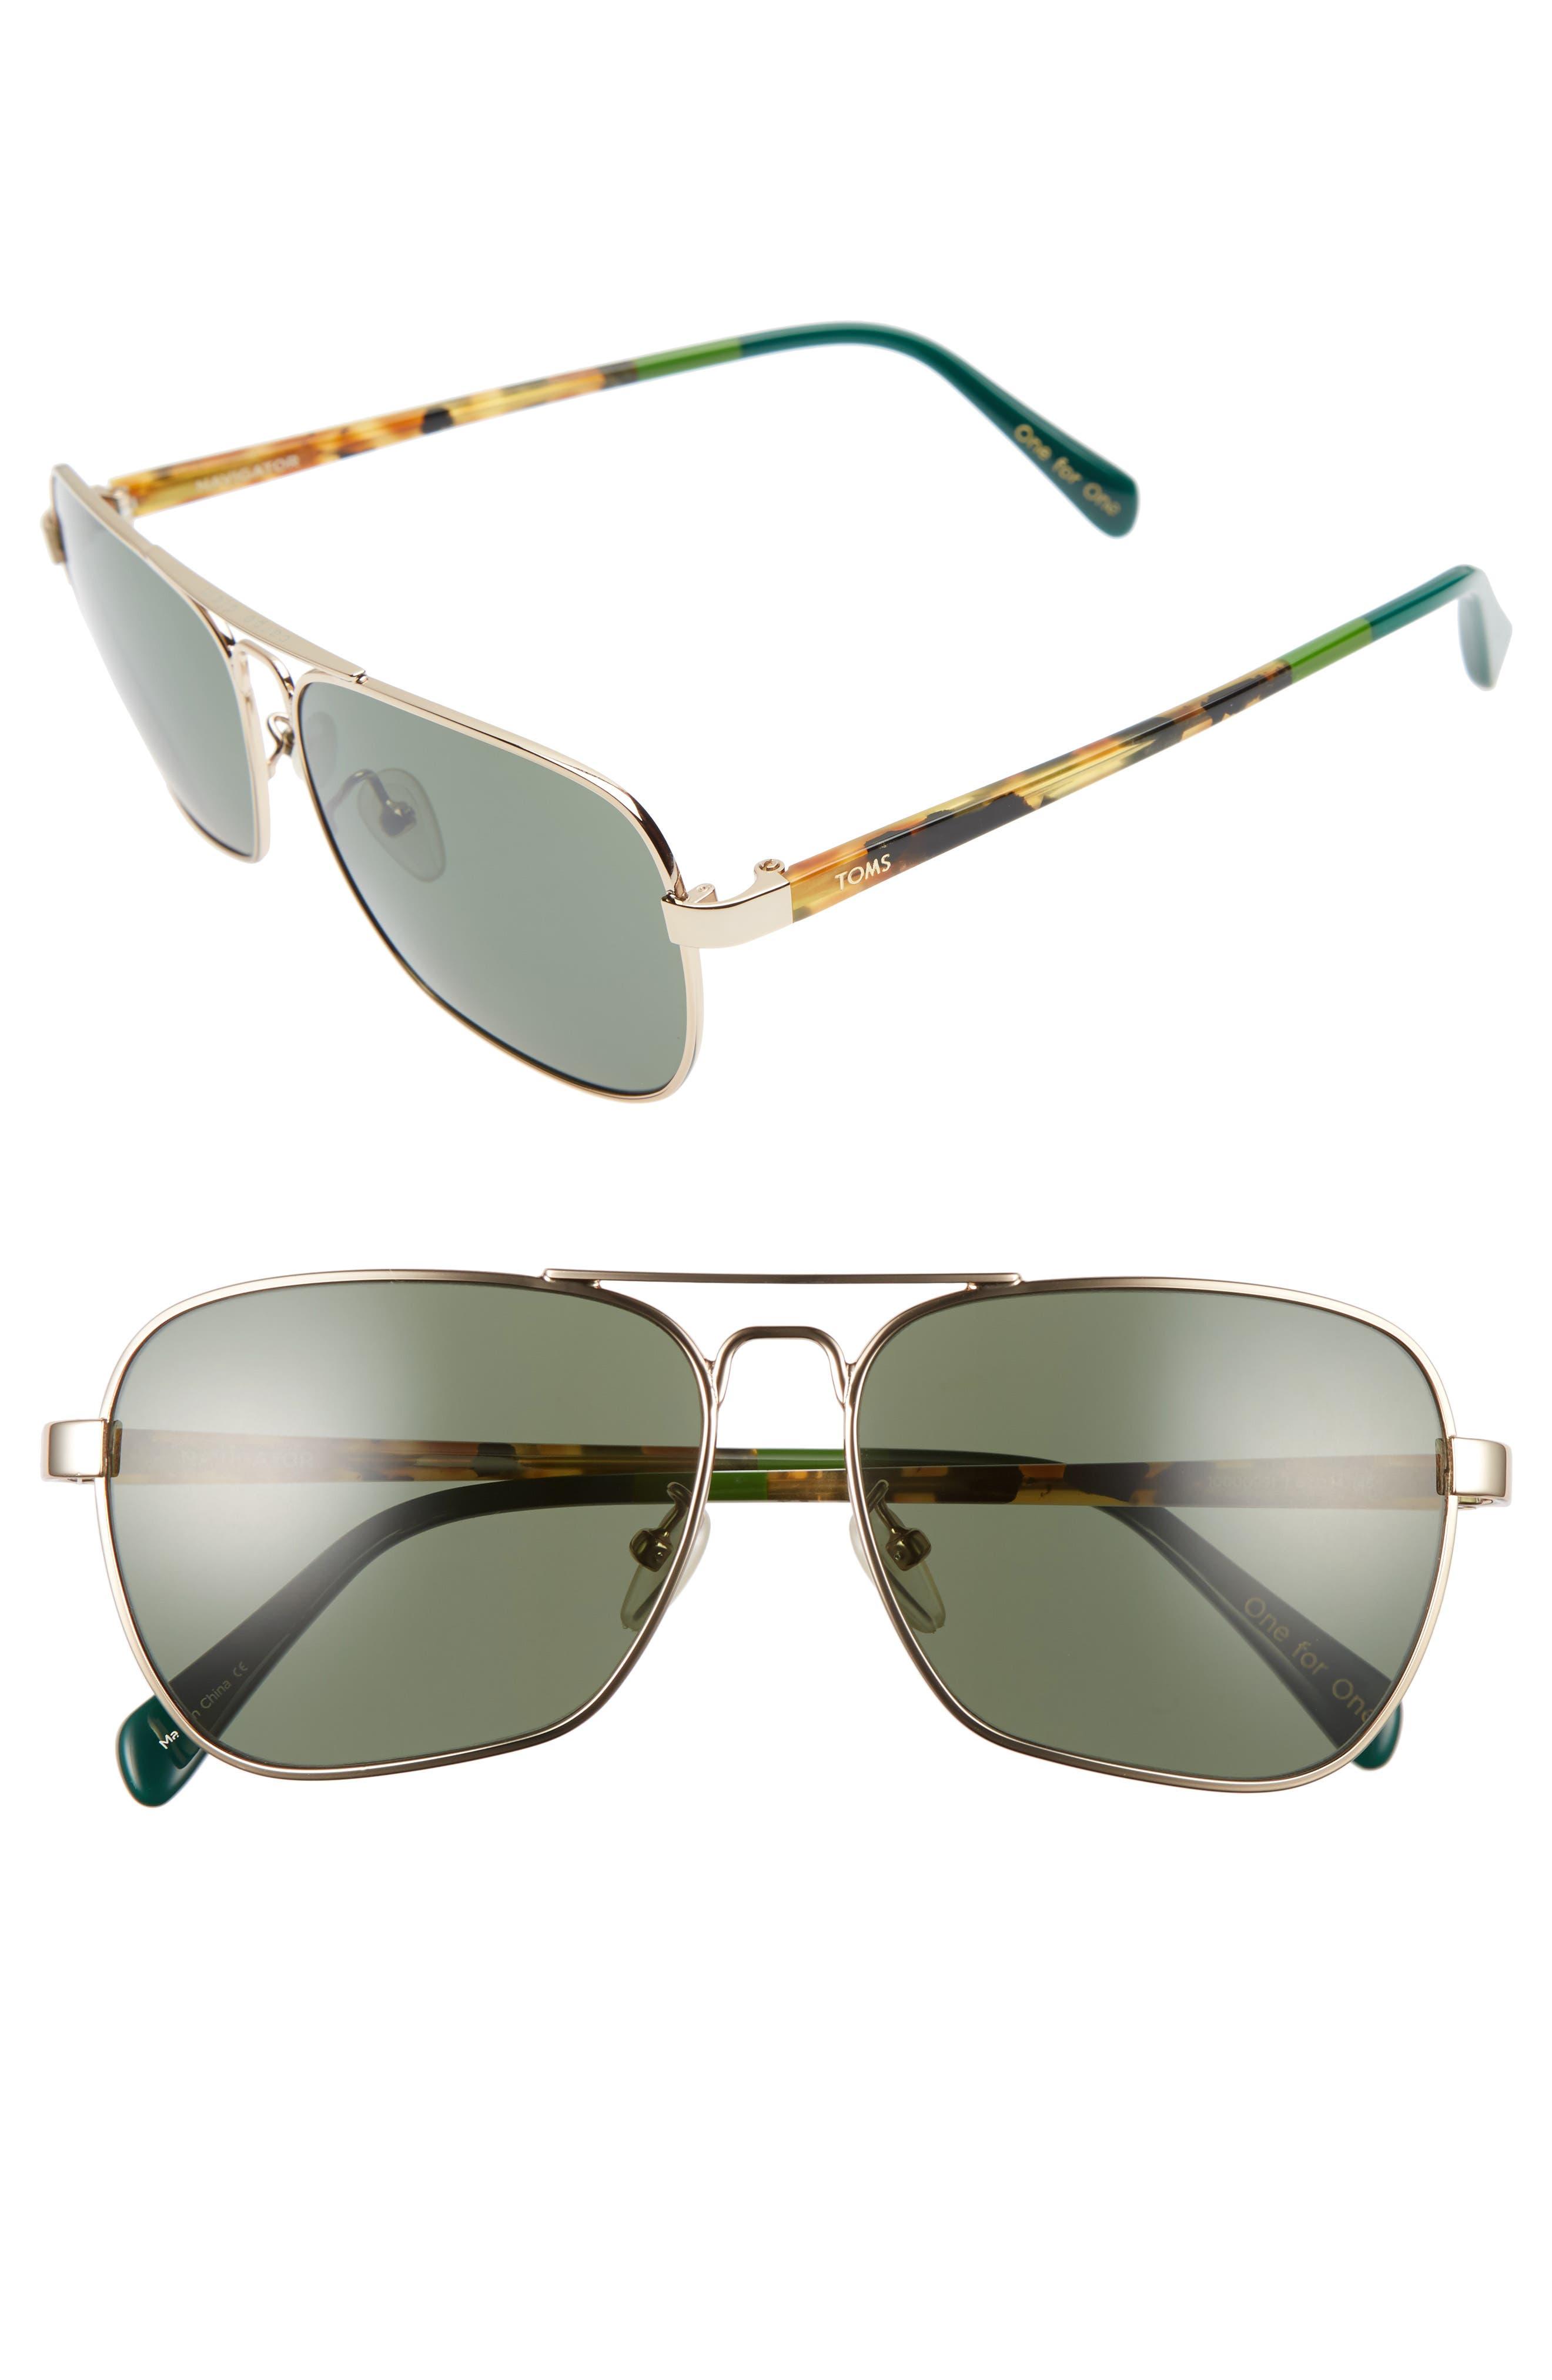 Navigator 201 58mm Sunglasses,                         Main,                         color,